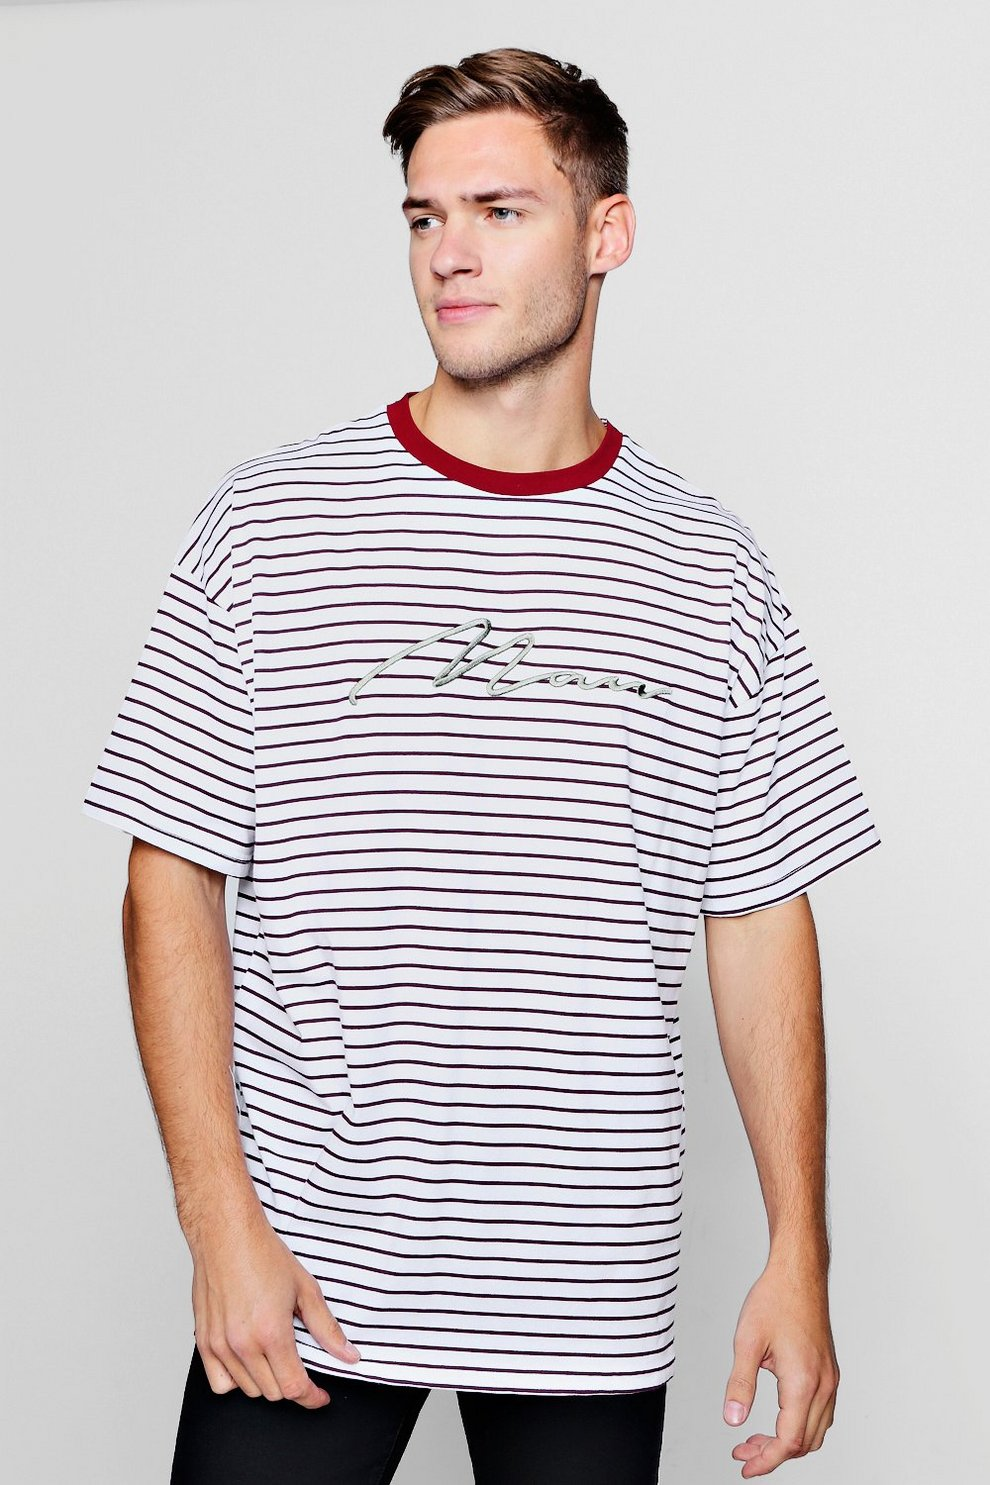 00e86f8010 Oversized Stripe MAN Embroidered T-Shirt